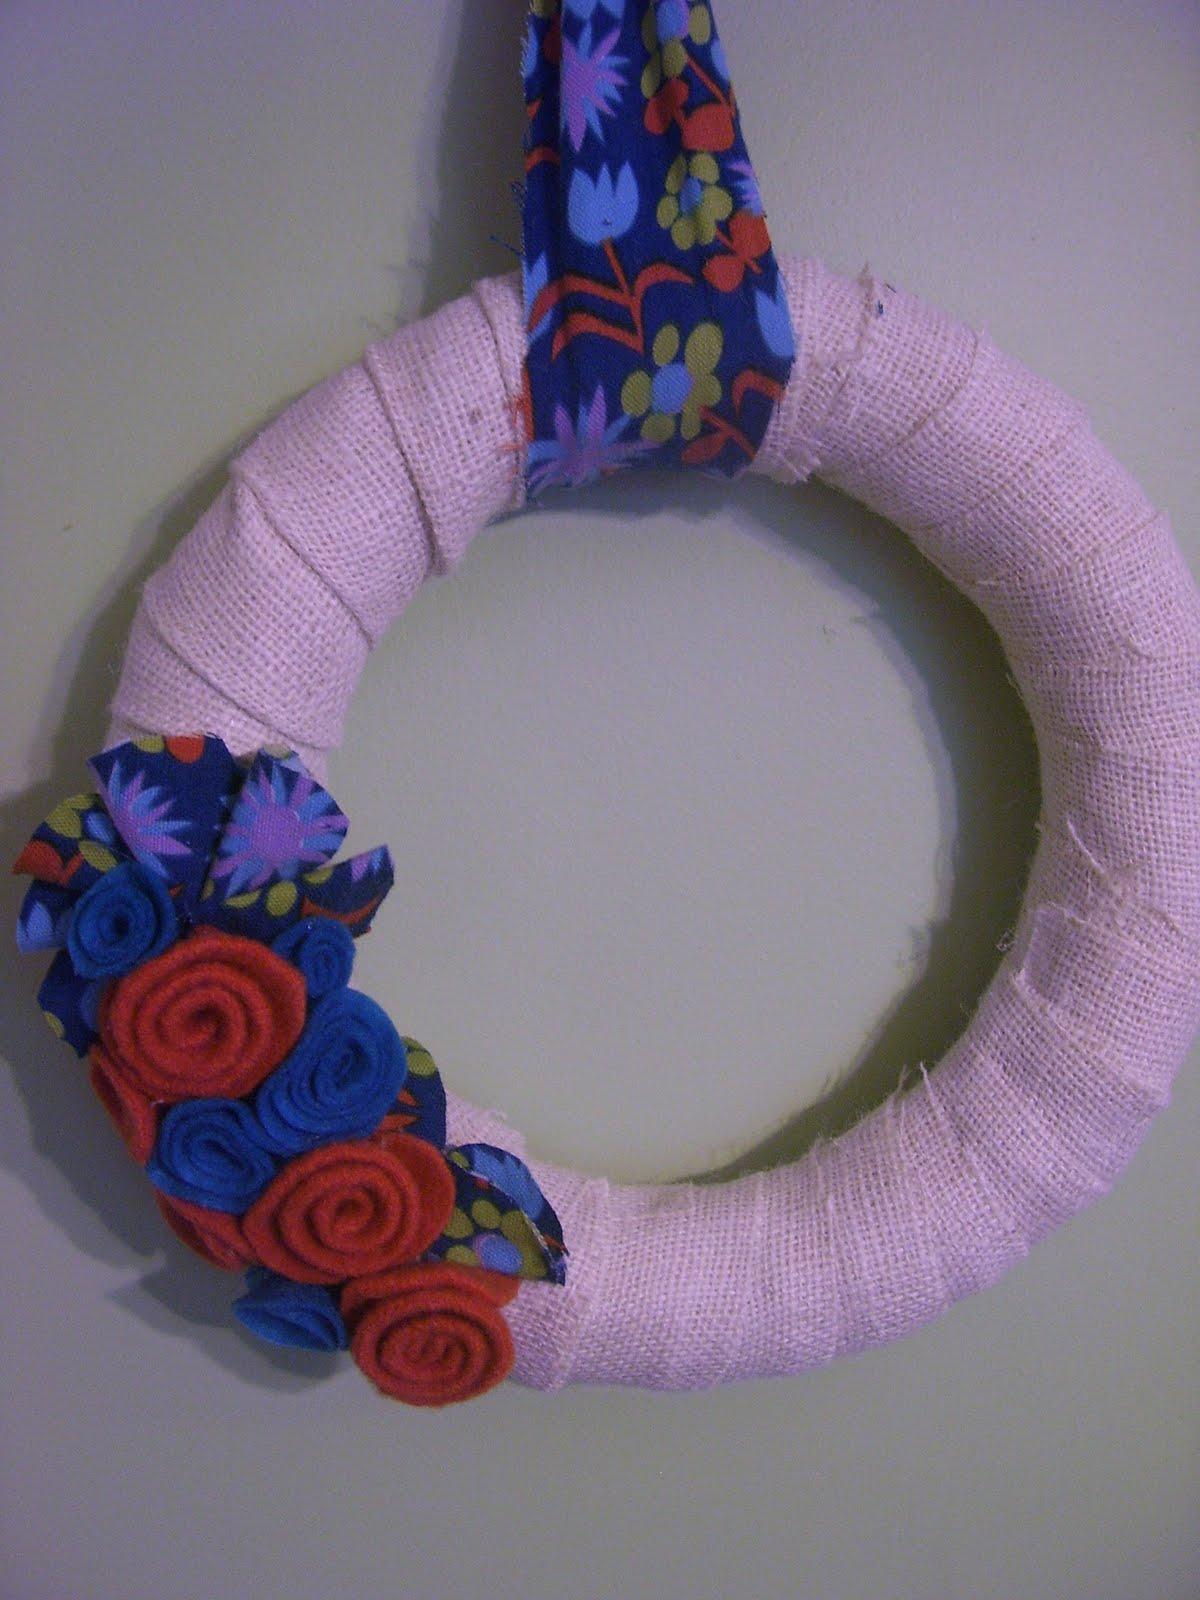 how to make felt flowers for wreaths